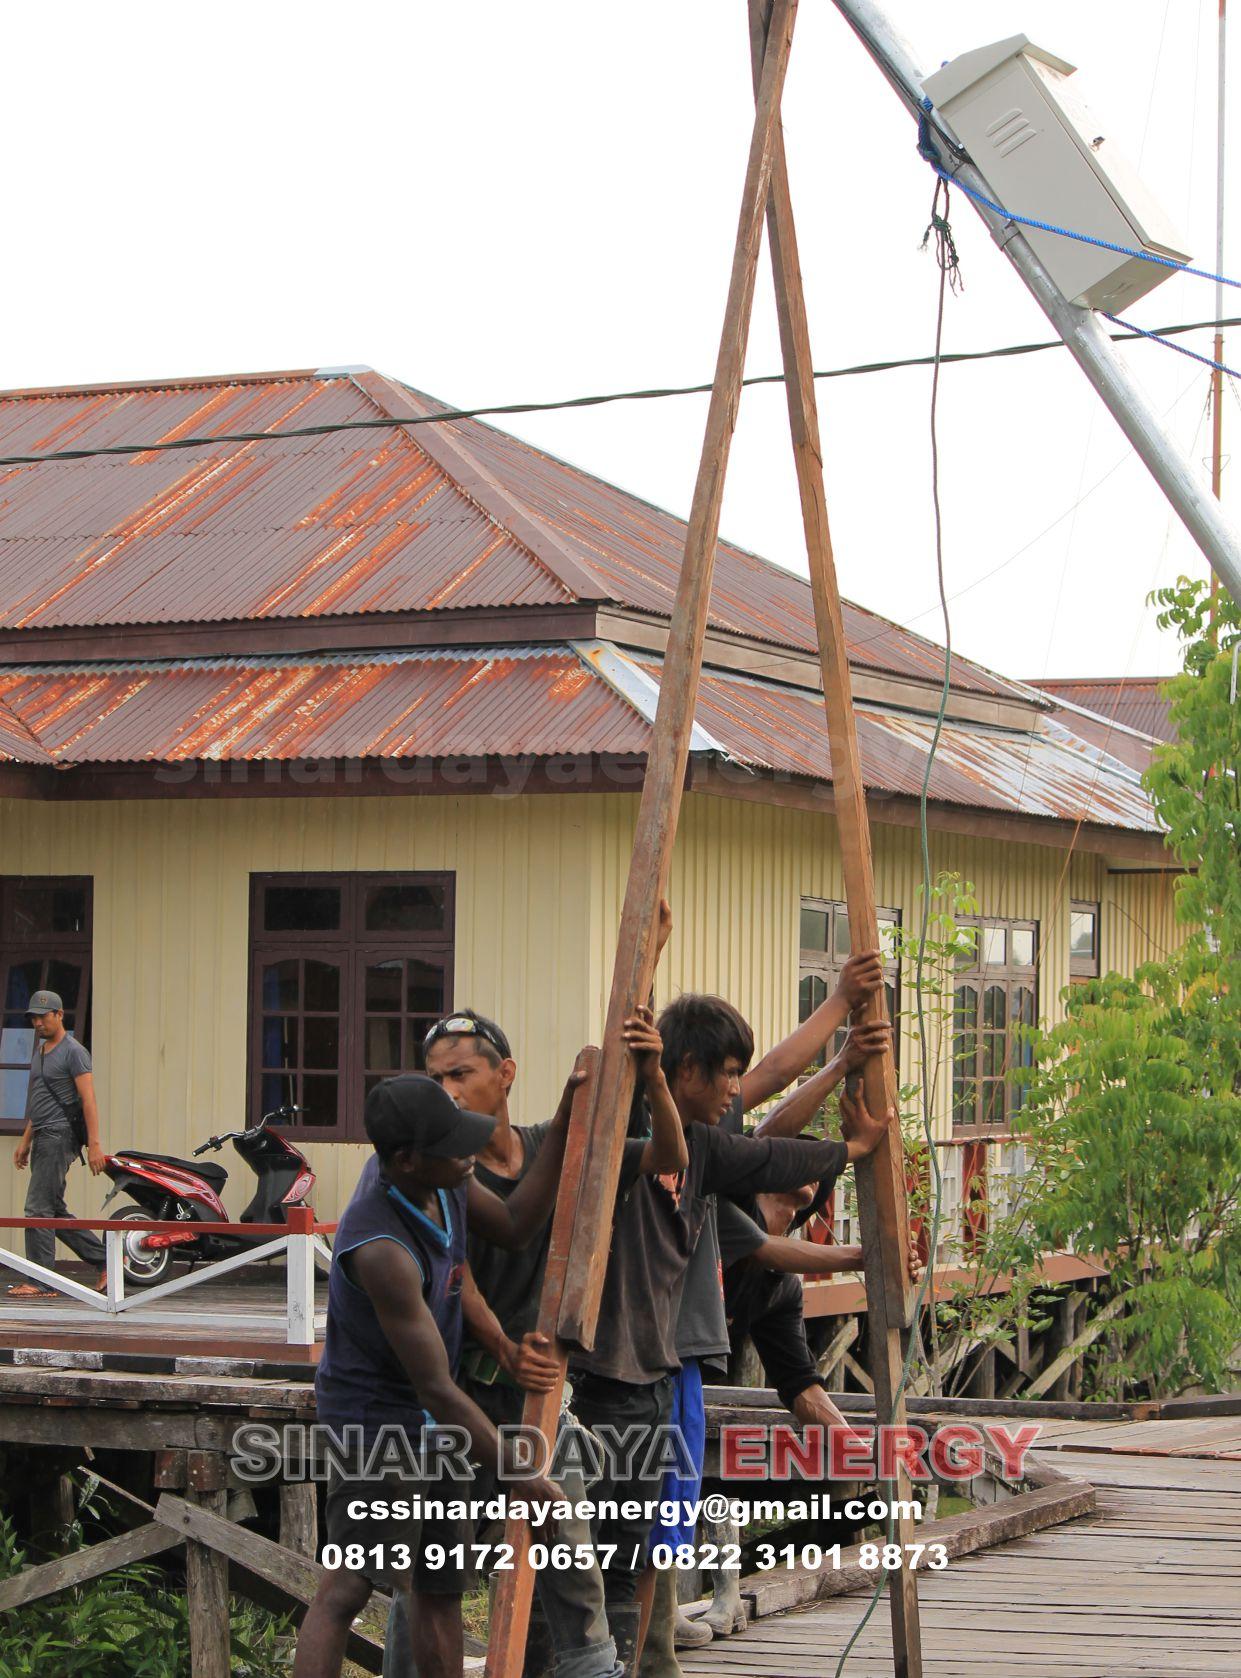 Lampu Jalan Solarcell Tenaga Surya Manokwari